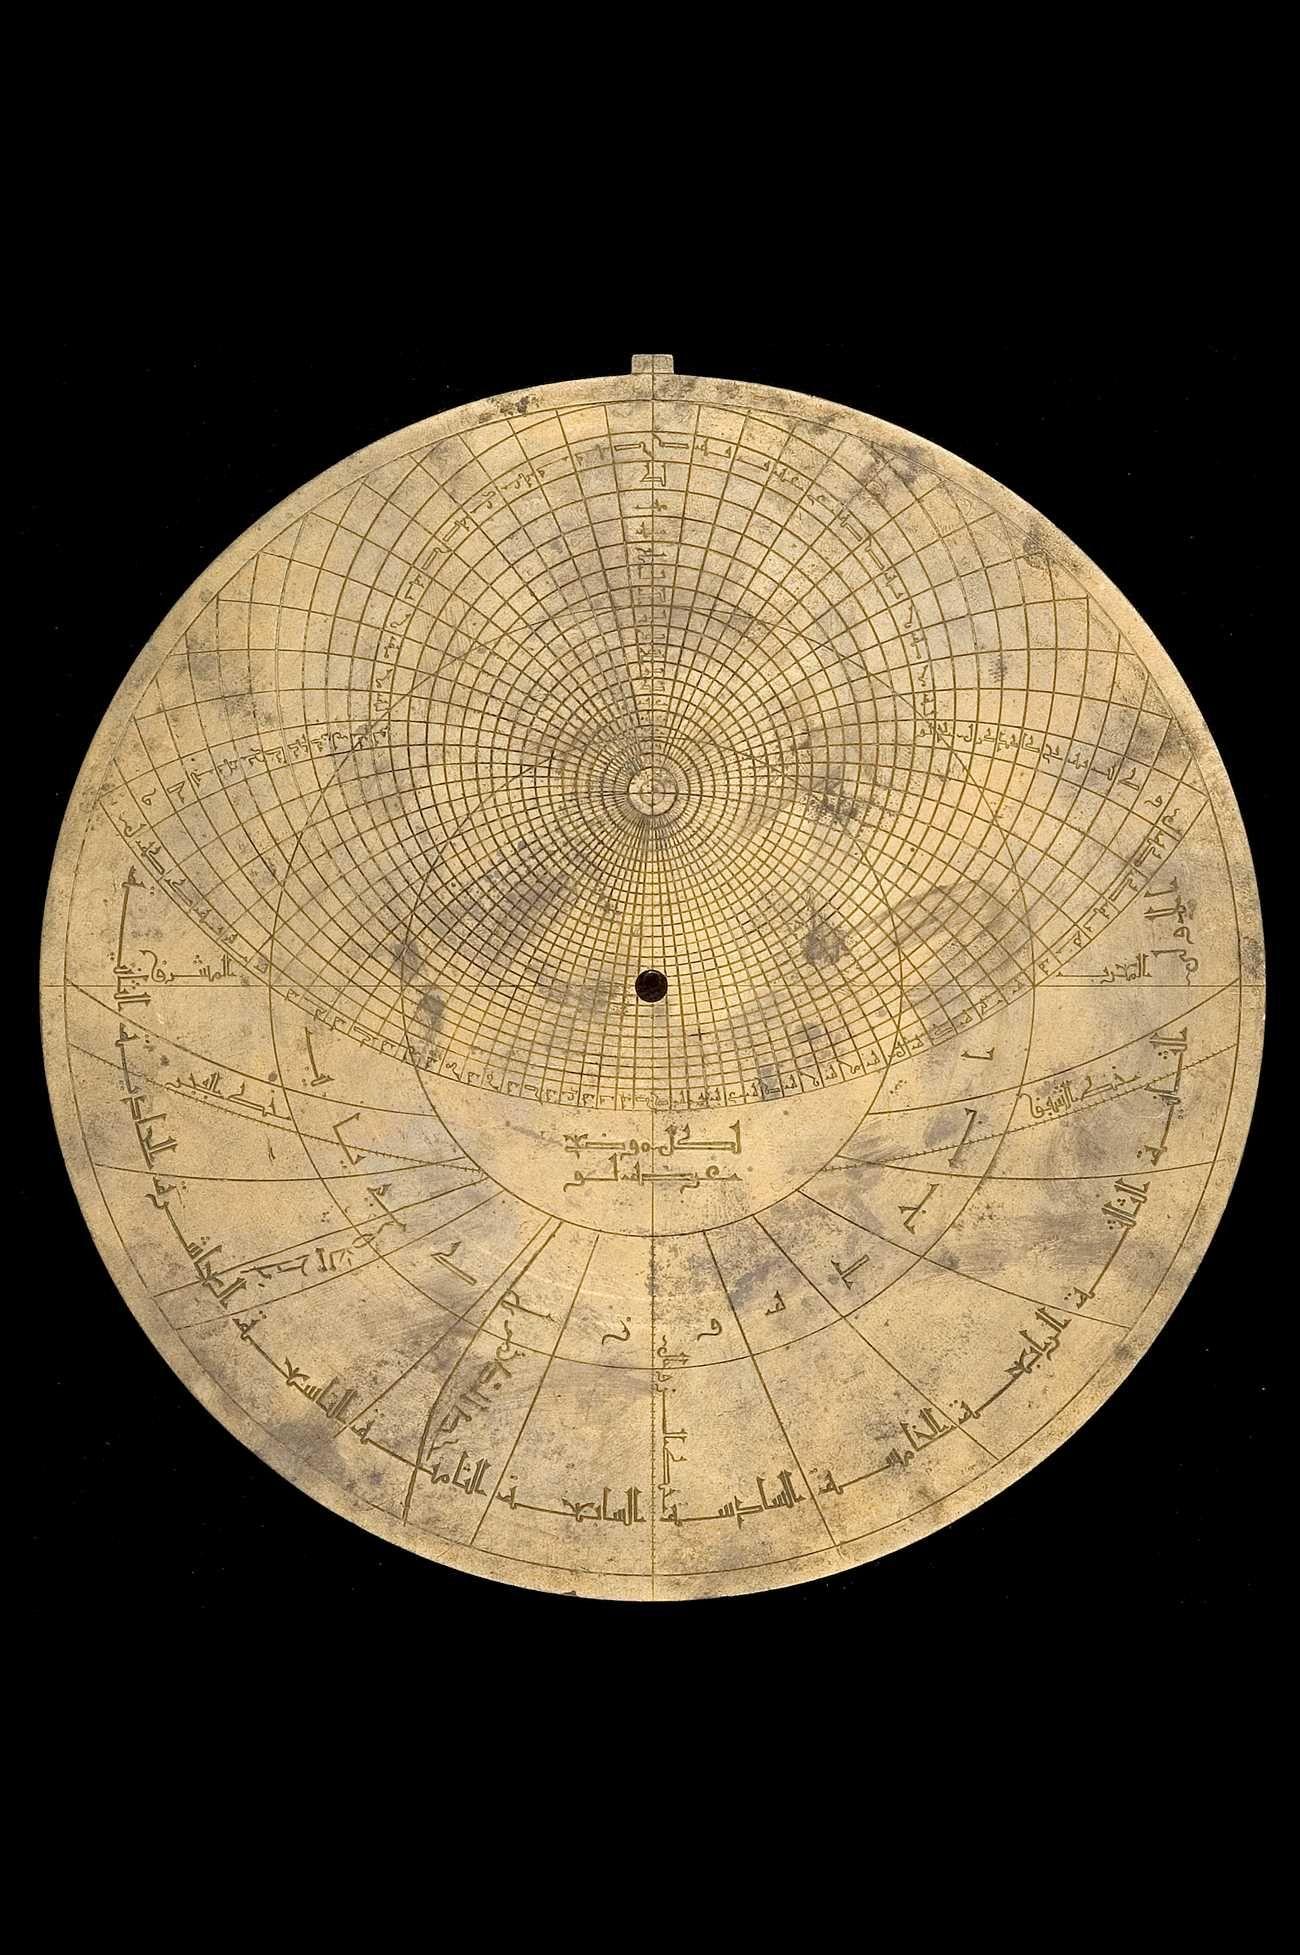 Date: 1221/2. Maker: Muḥammad ibn Fattūḥ al-Khamā'irī. Place: Seville. Material:Brass. Astrolabe Catalogue Inventory no.44141. The throne is of the moorish arch type made of brass attached with integrated base made of brass and omega type shackle made of brass . The rete contains 29 stars. The zodiac on the rete is labelled: الحمل , الثور , الجوزا , السرطان , الاسد , السنبله , الميزان , العقرب , القوس , الجدي , الدلو , الحوت.